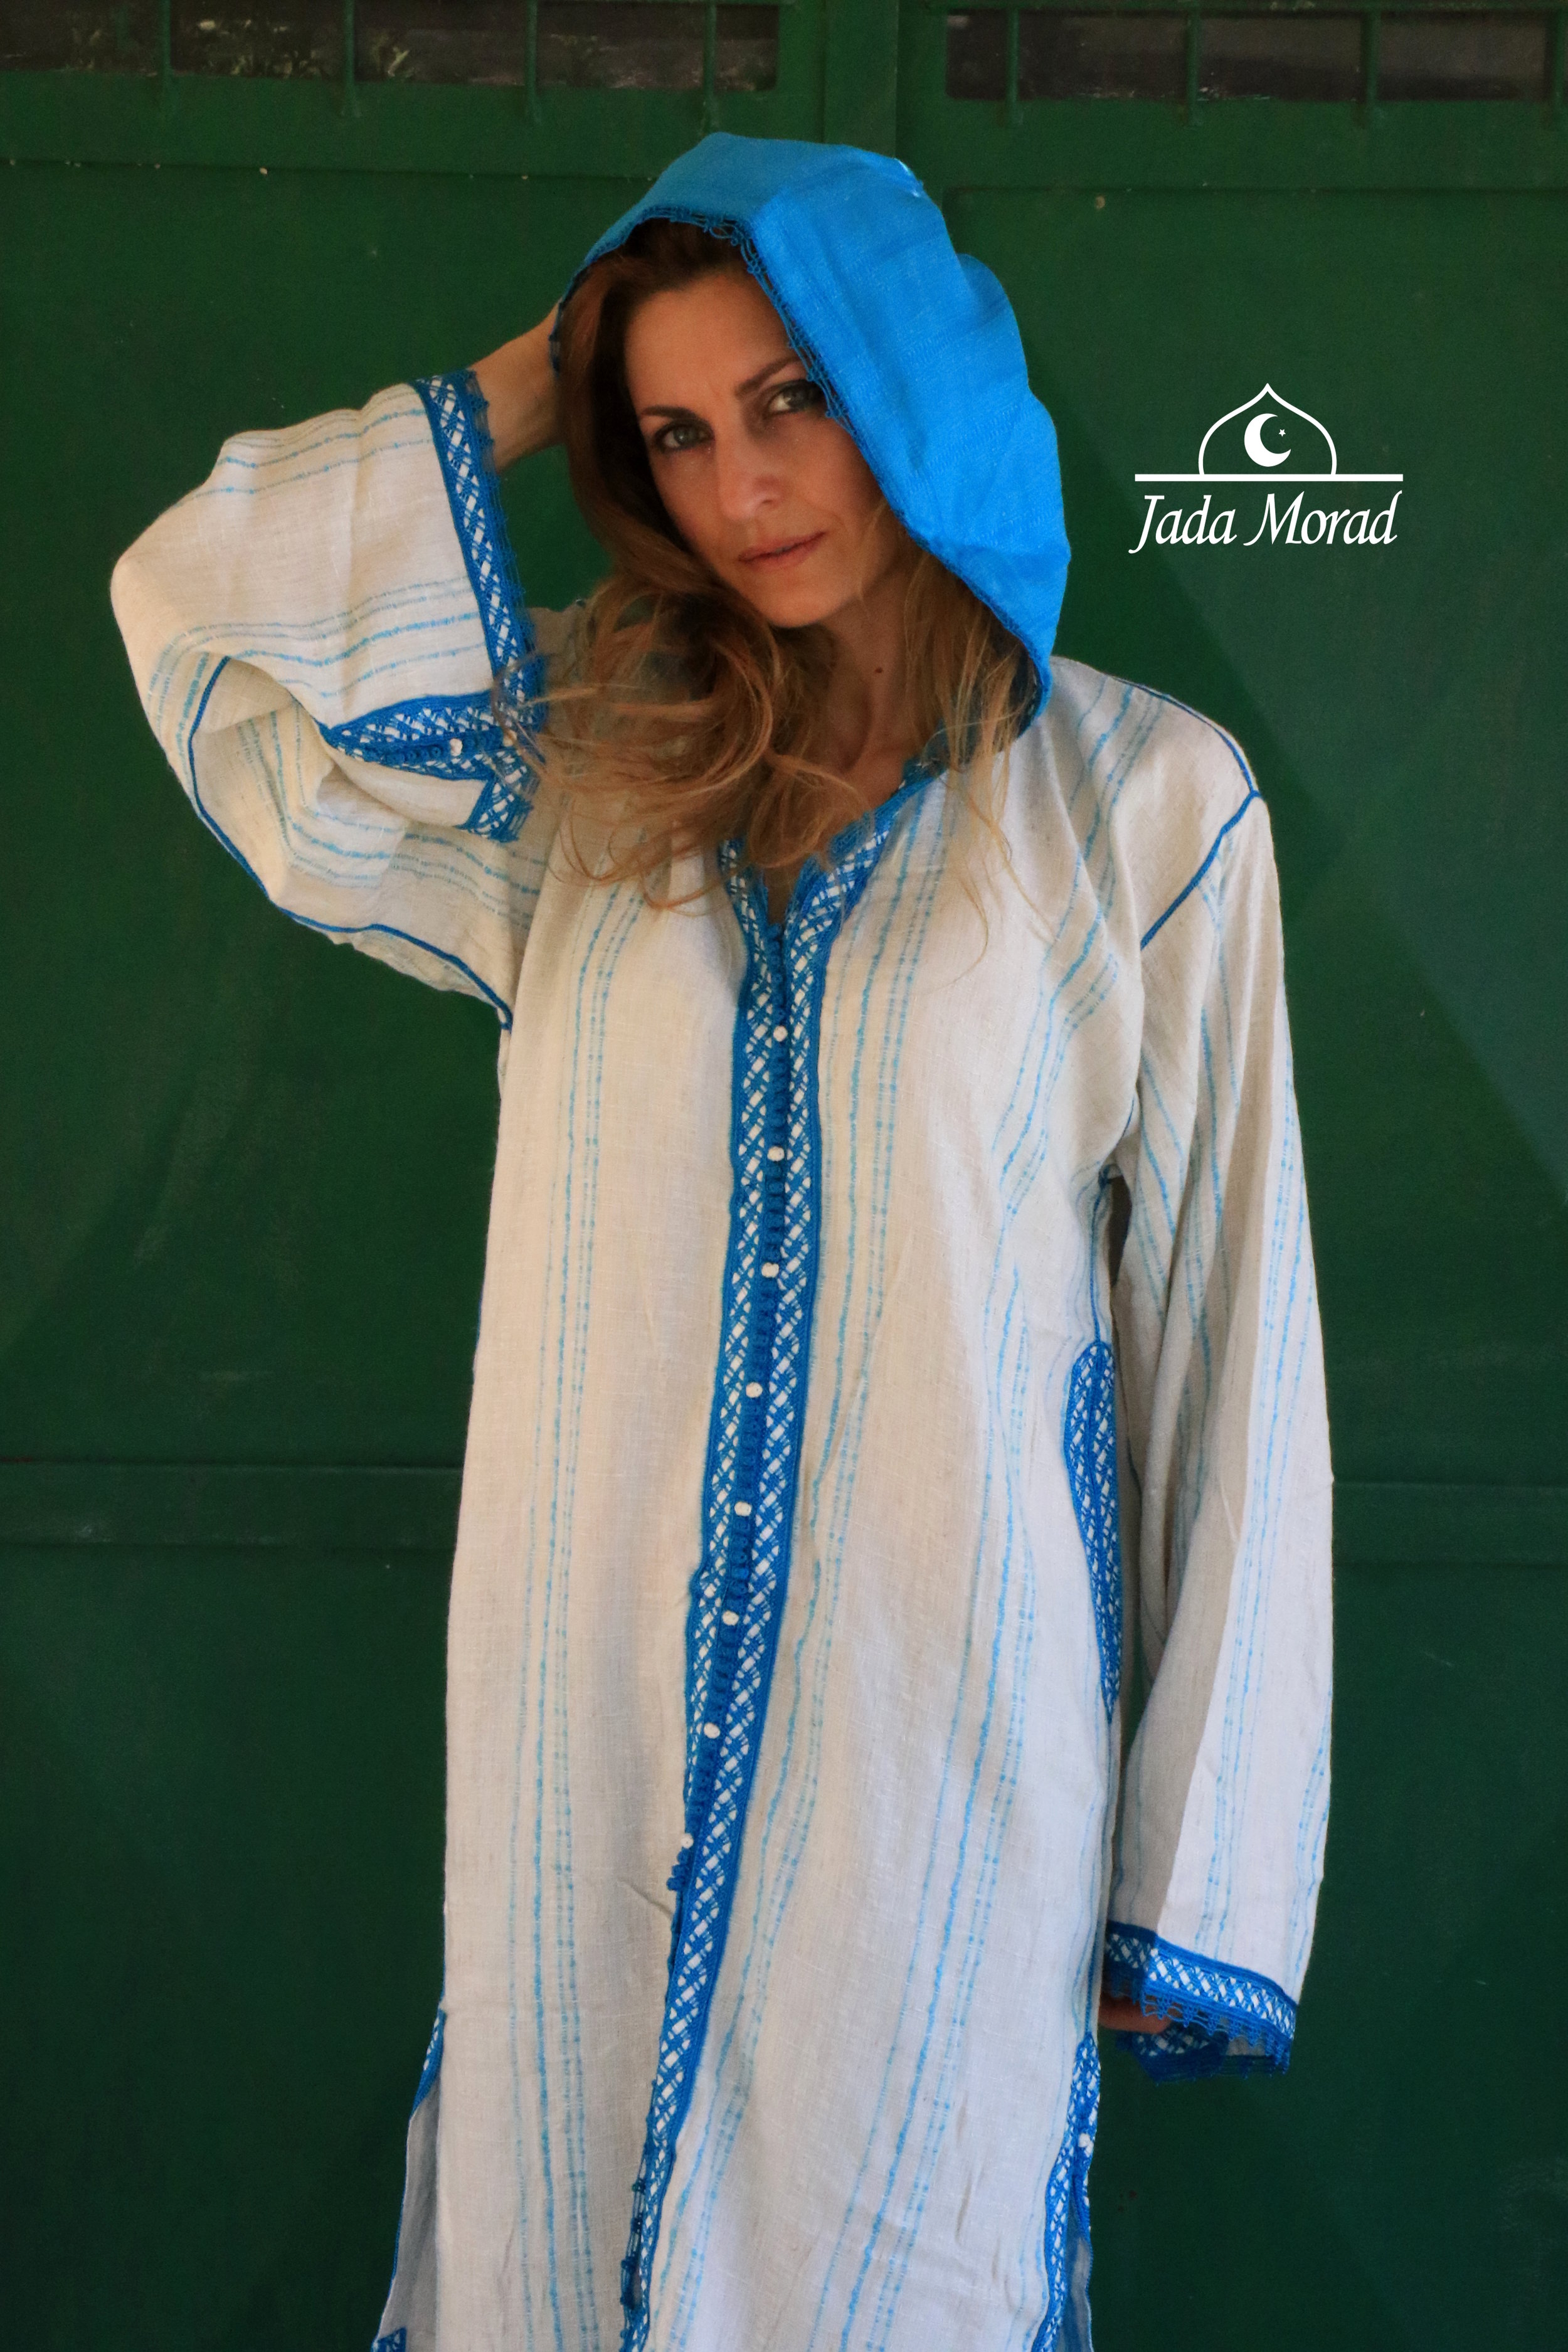 Jada Morad Tunisian traditional dress (2).JPG